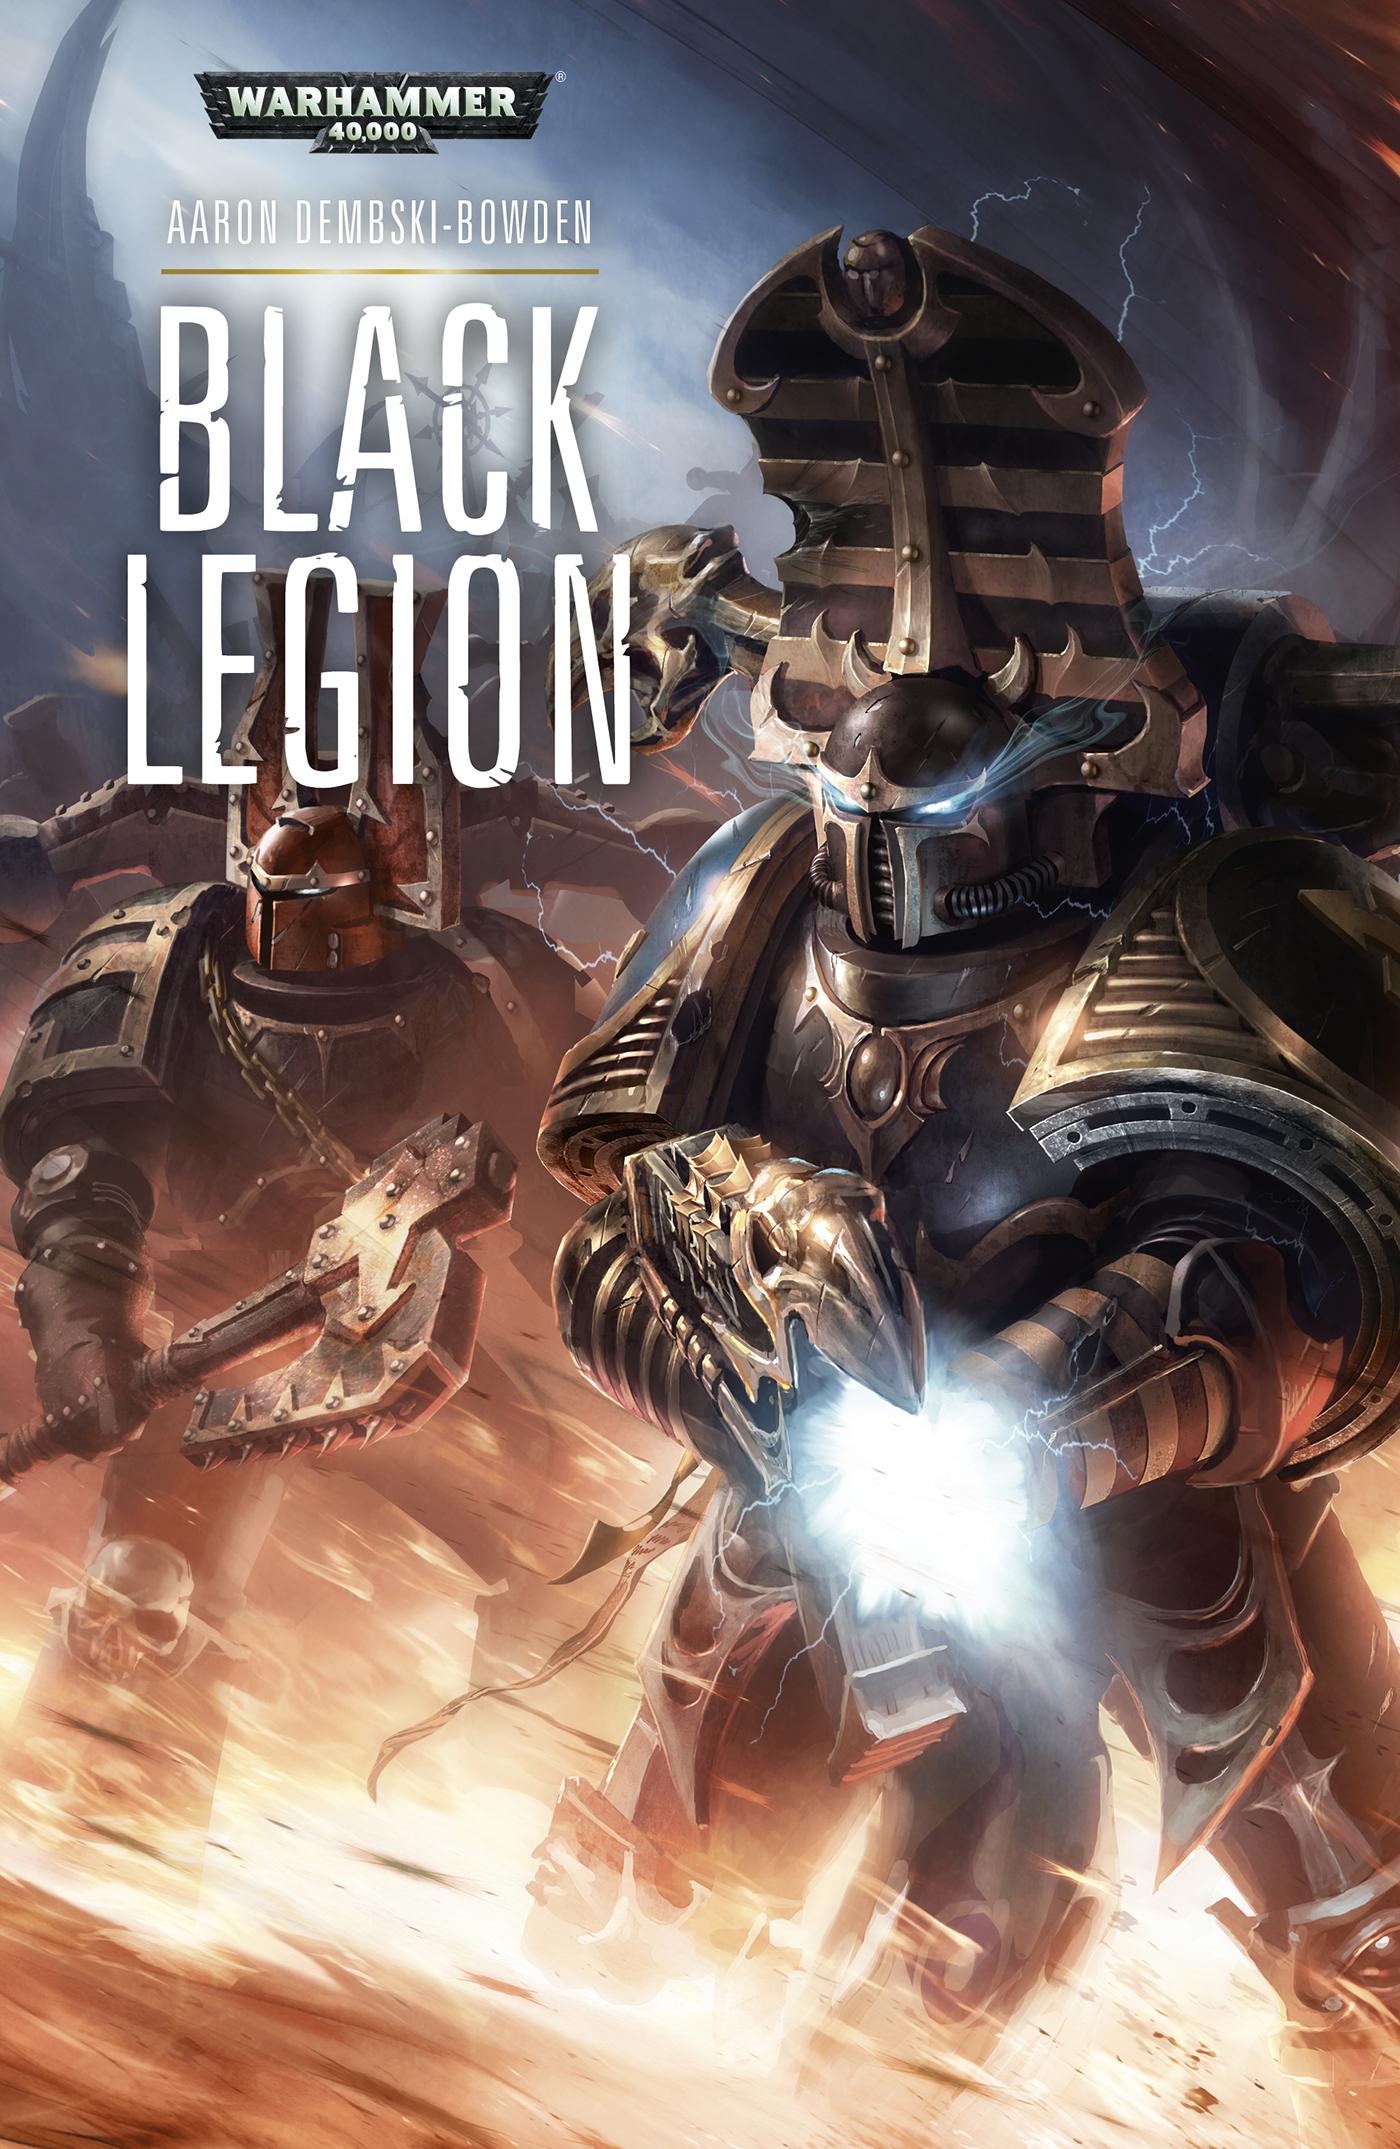 Black Legion by Aaron Dembski-Bowden